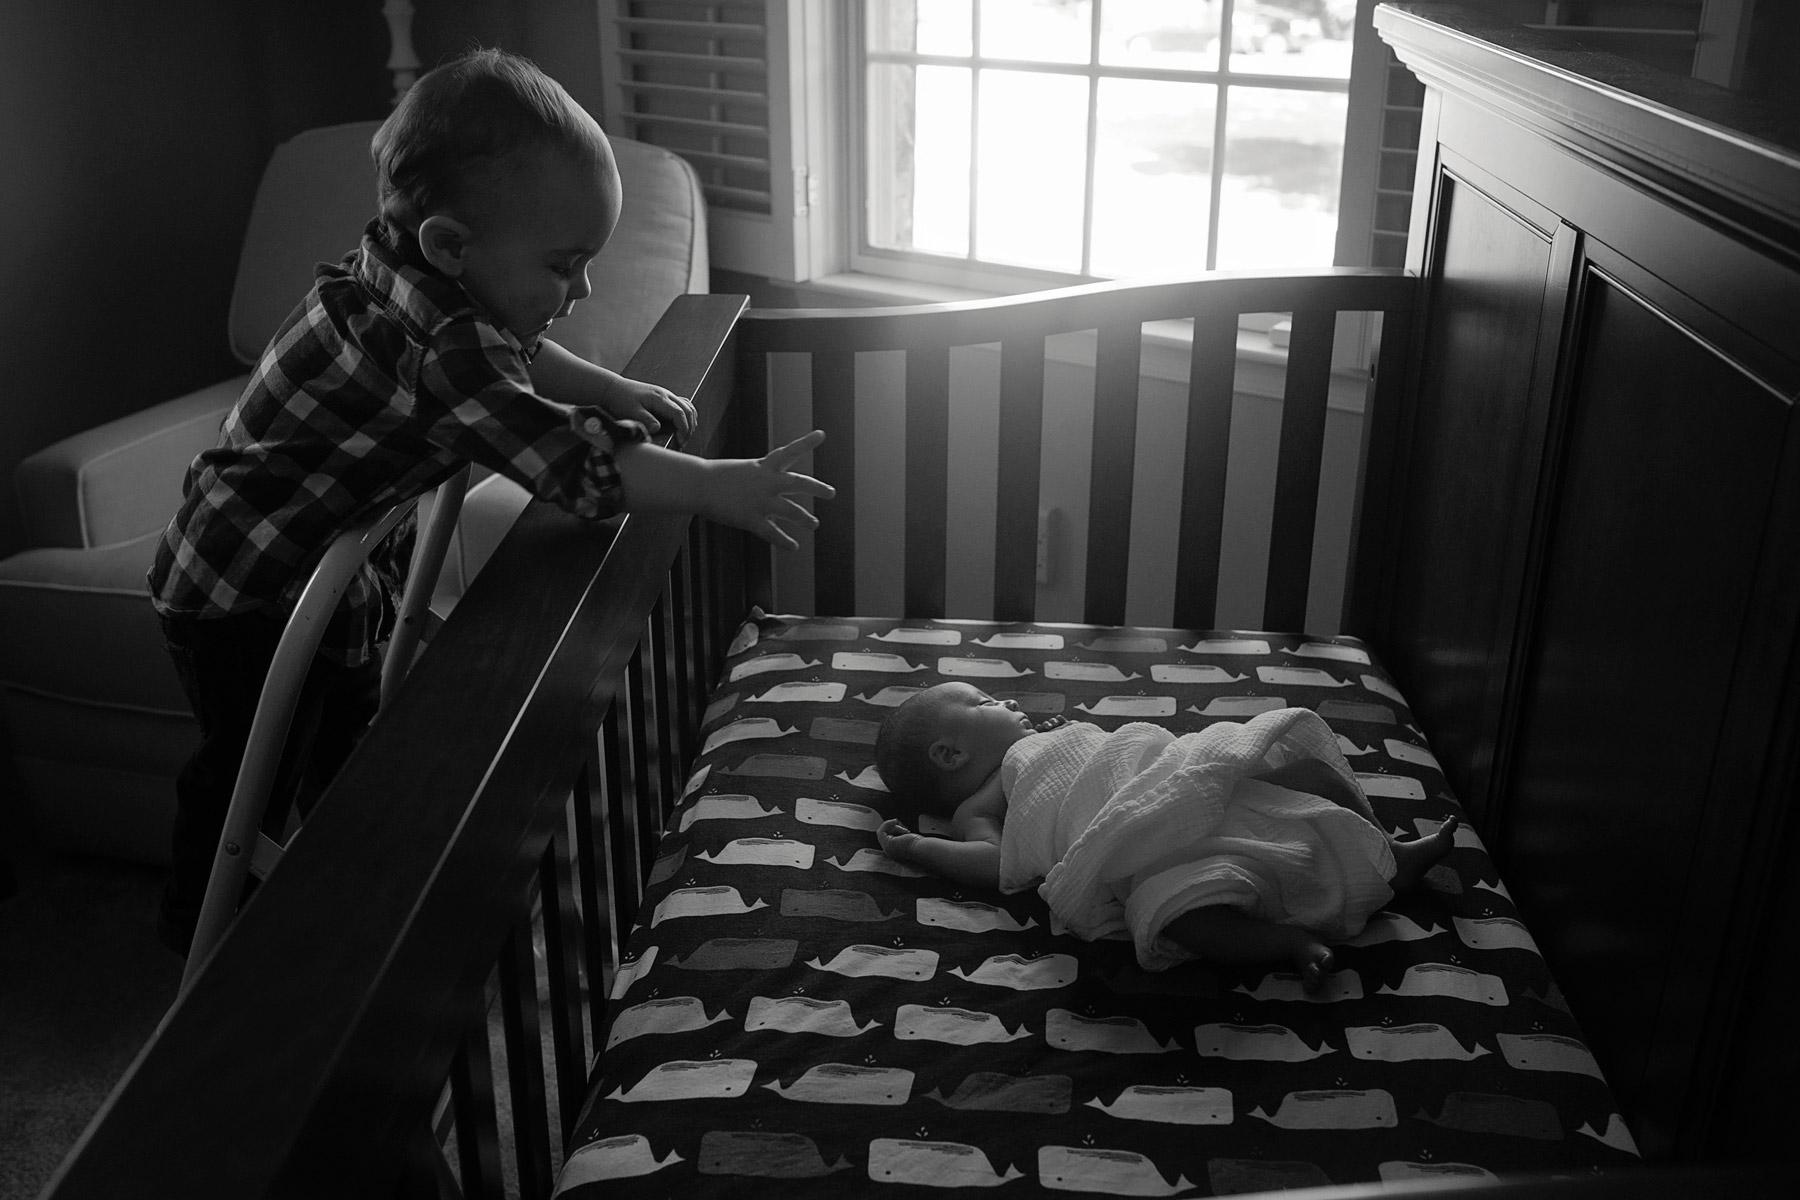 Main_Line_Newborn_photographer_Lifestyle_newborn_photographer04_big_brother_reaching_for_newborn.JPG